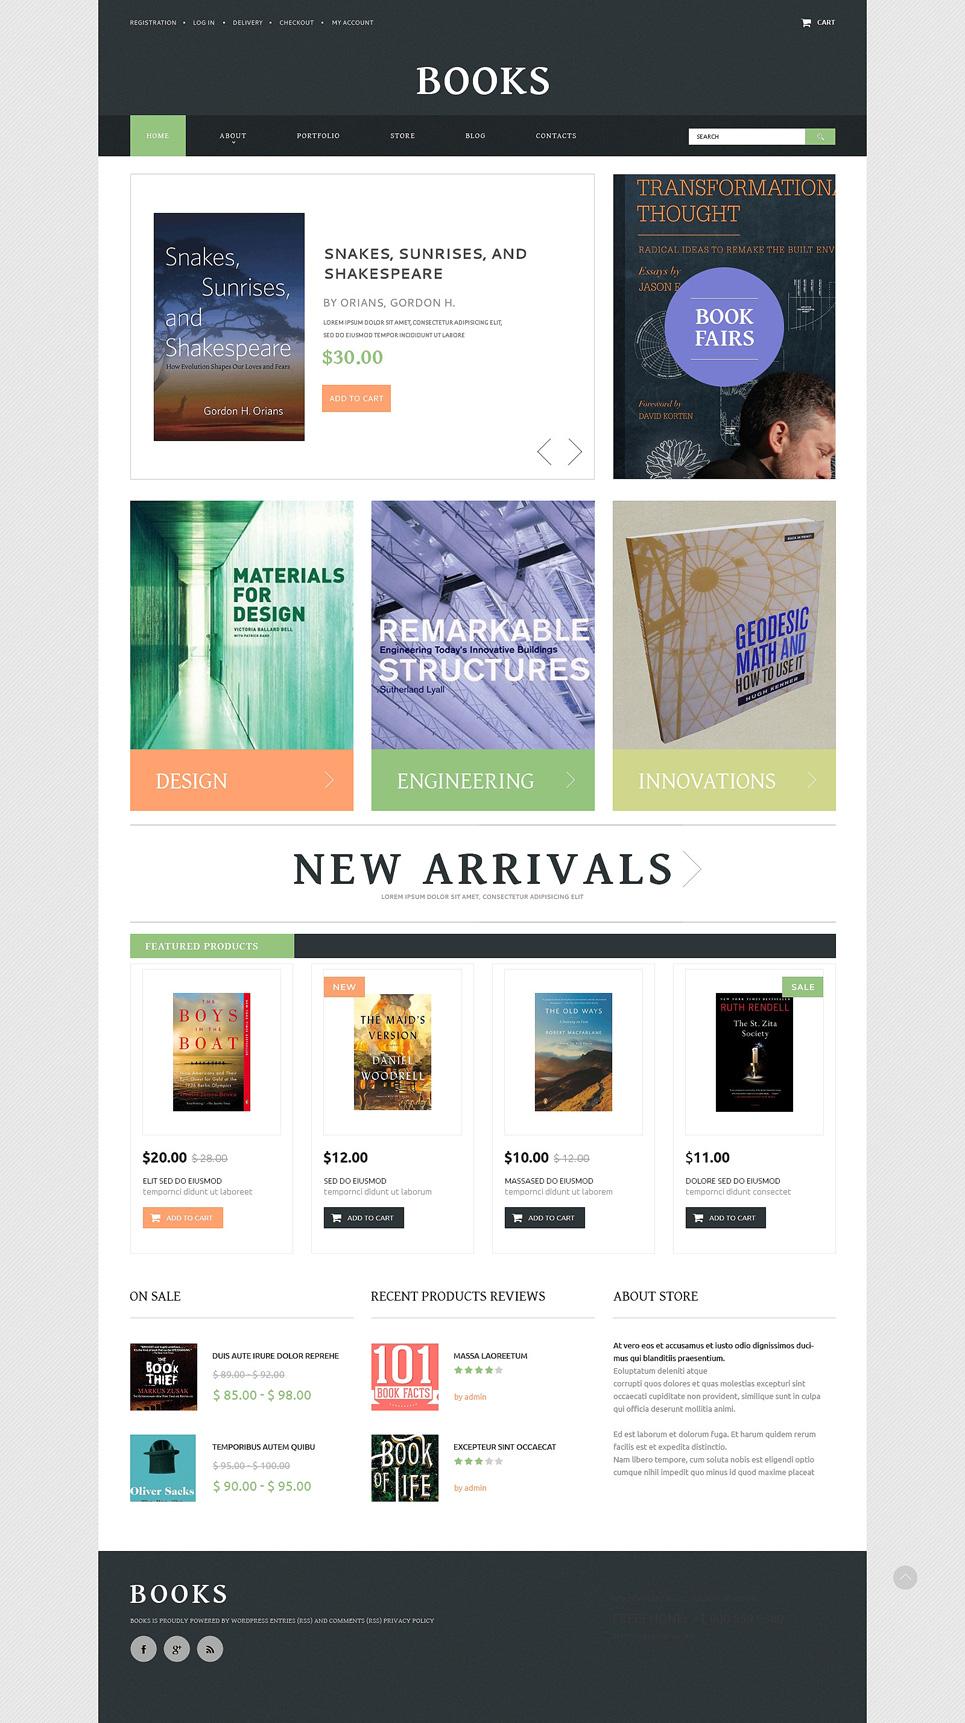 Books Website Templates by Daniel C. Adams